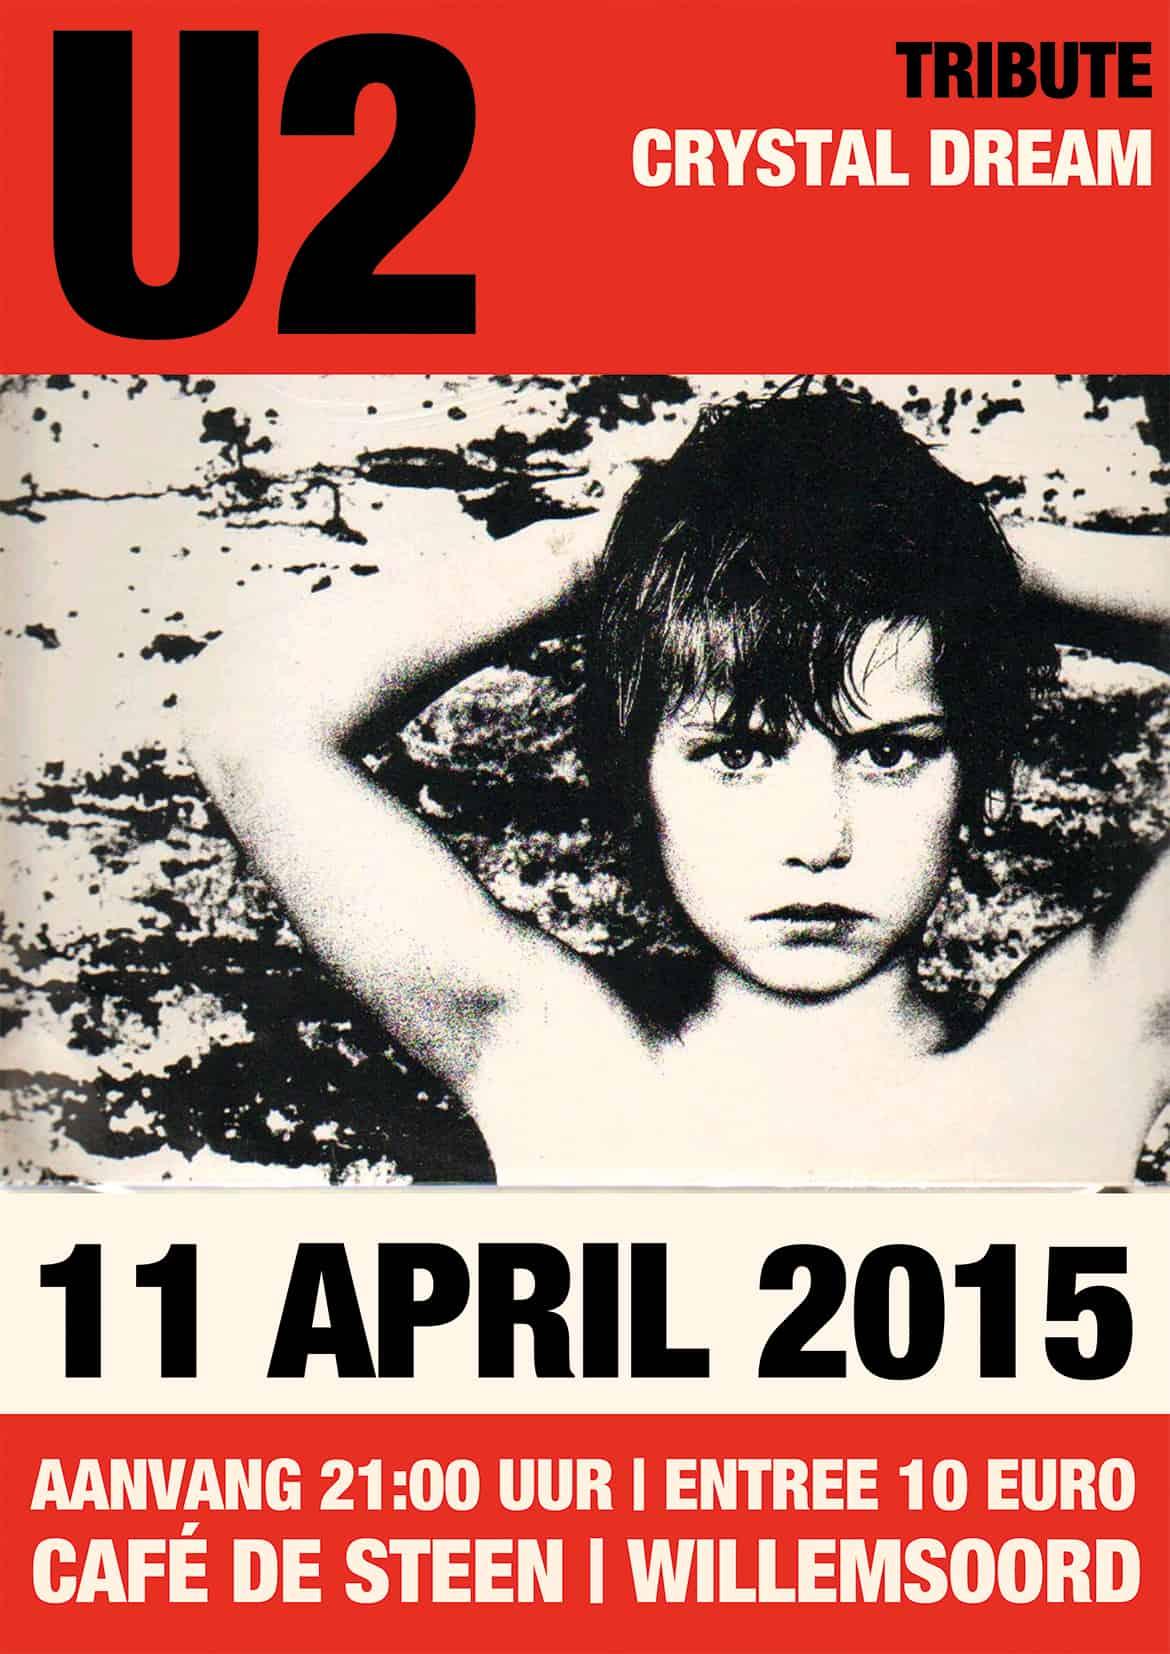 u2-tribute-poster-web